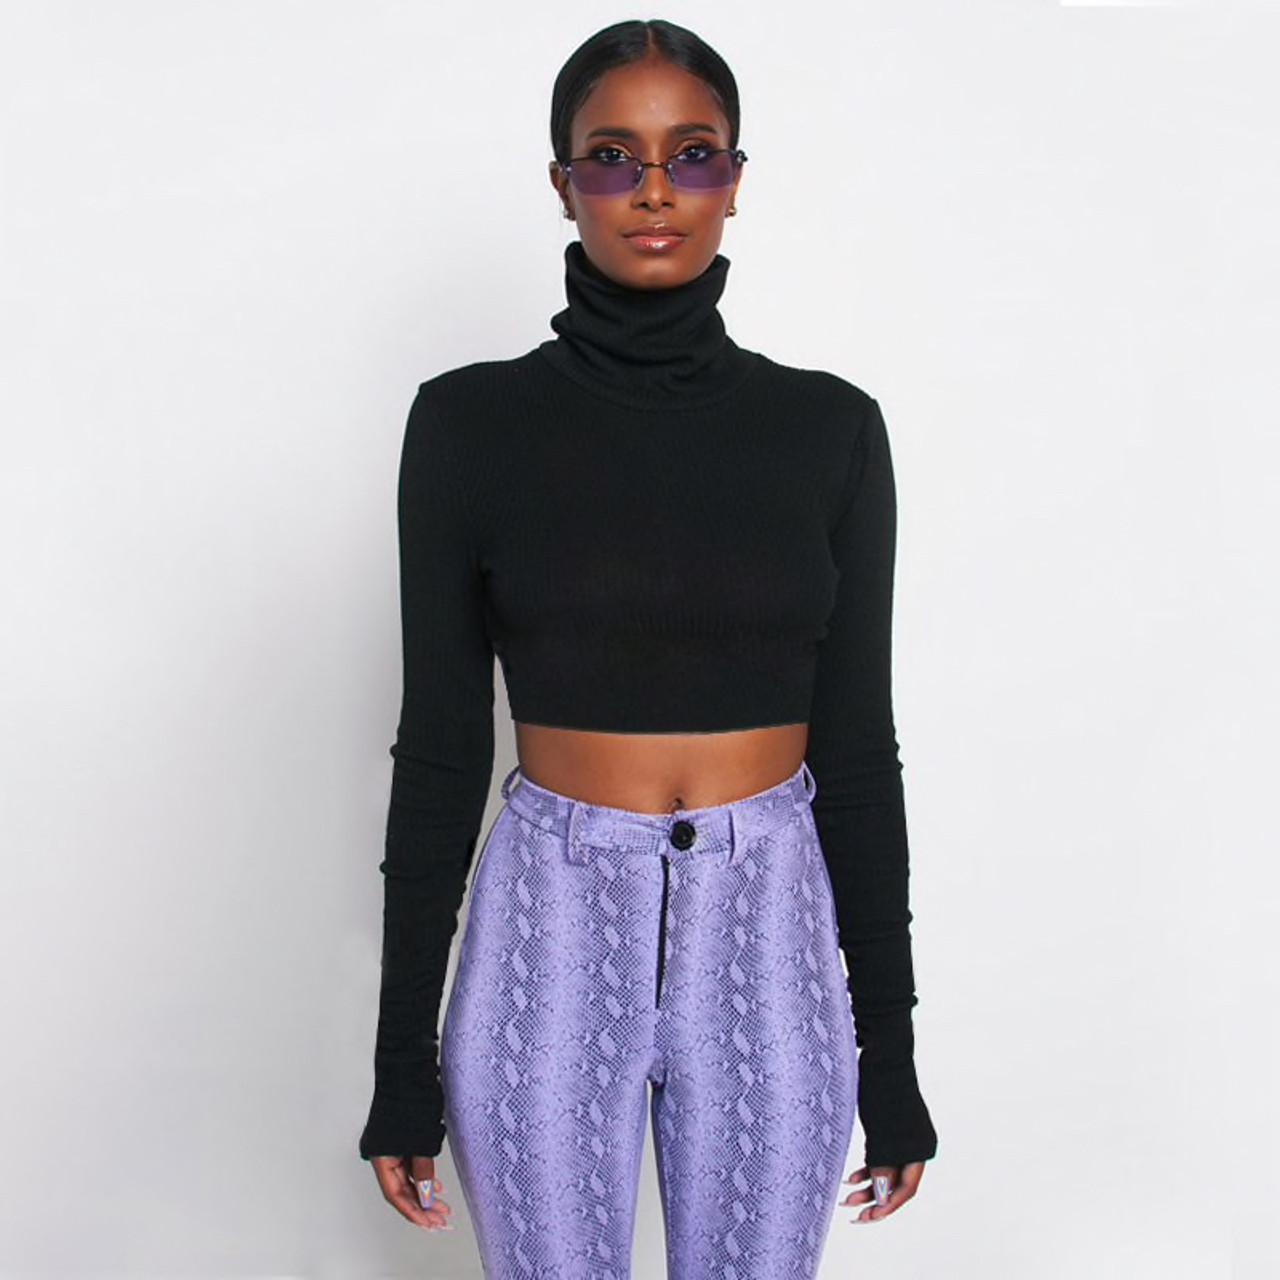 317ec878 Women Turtleneck Ribbed Sweatshirt Long Sleeve Fluorescent Color Pullovers  Crop Slim Mujer Warm Knit Jumpers Short Tops {Black}